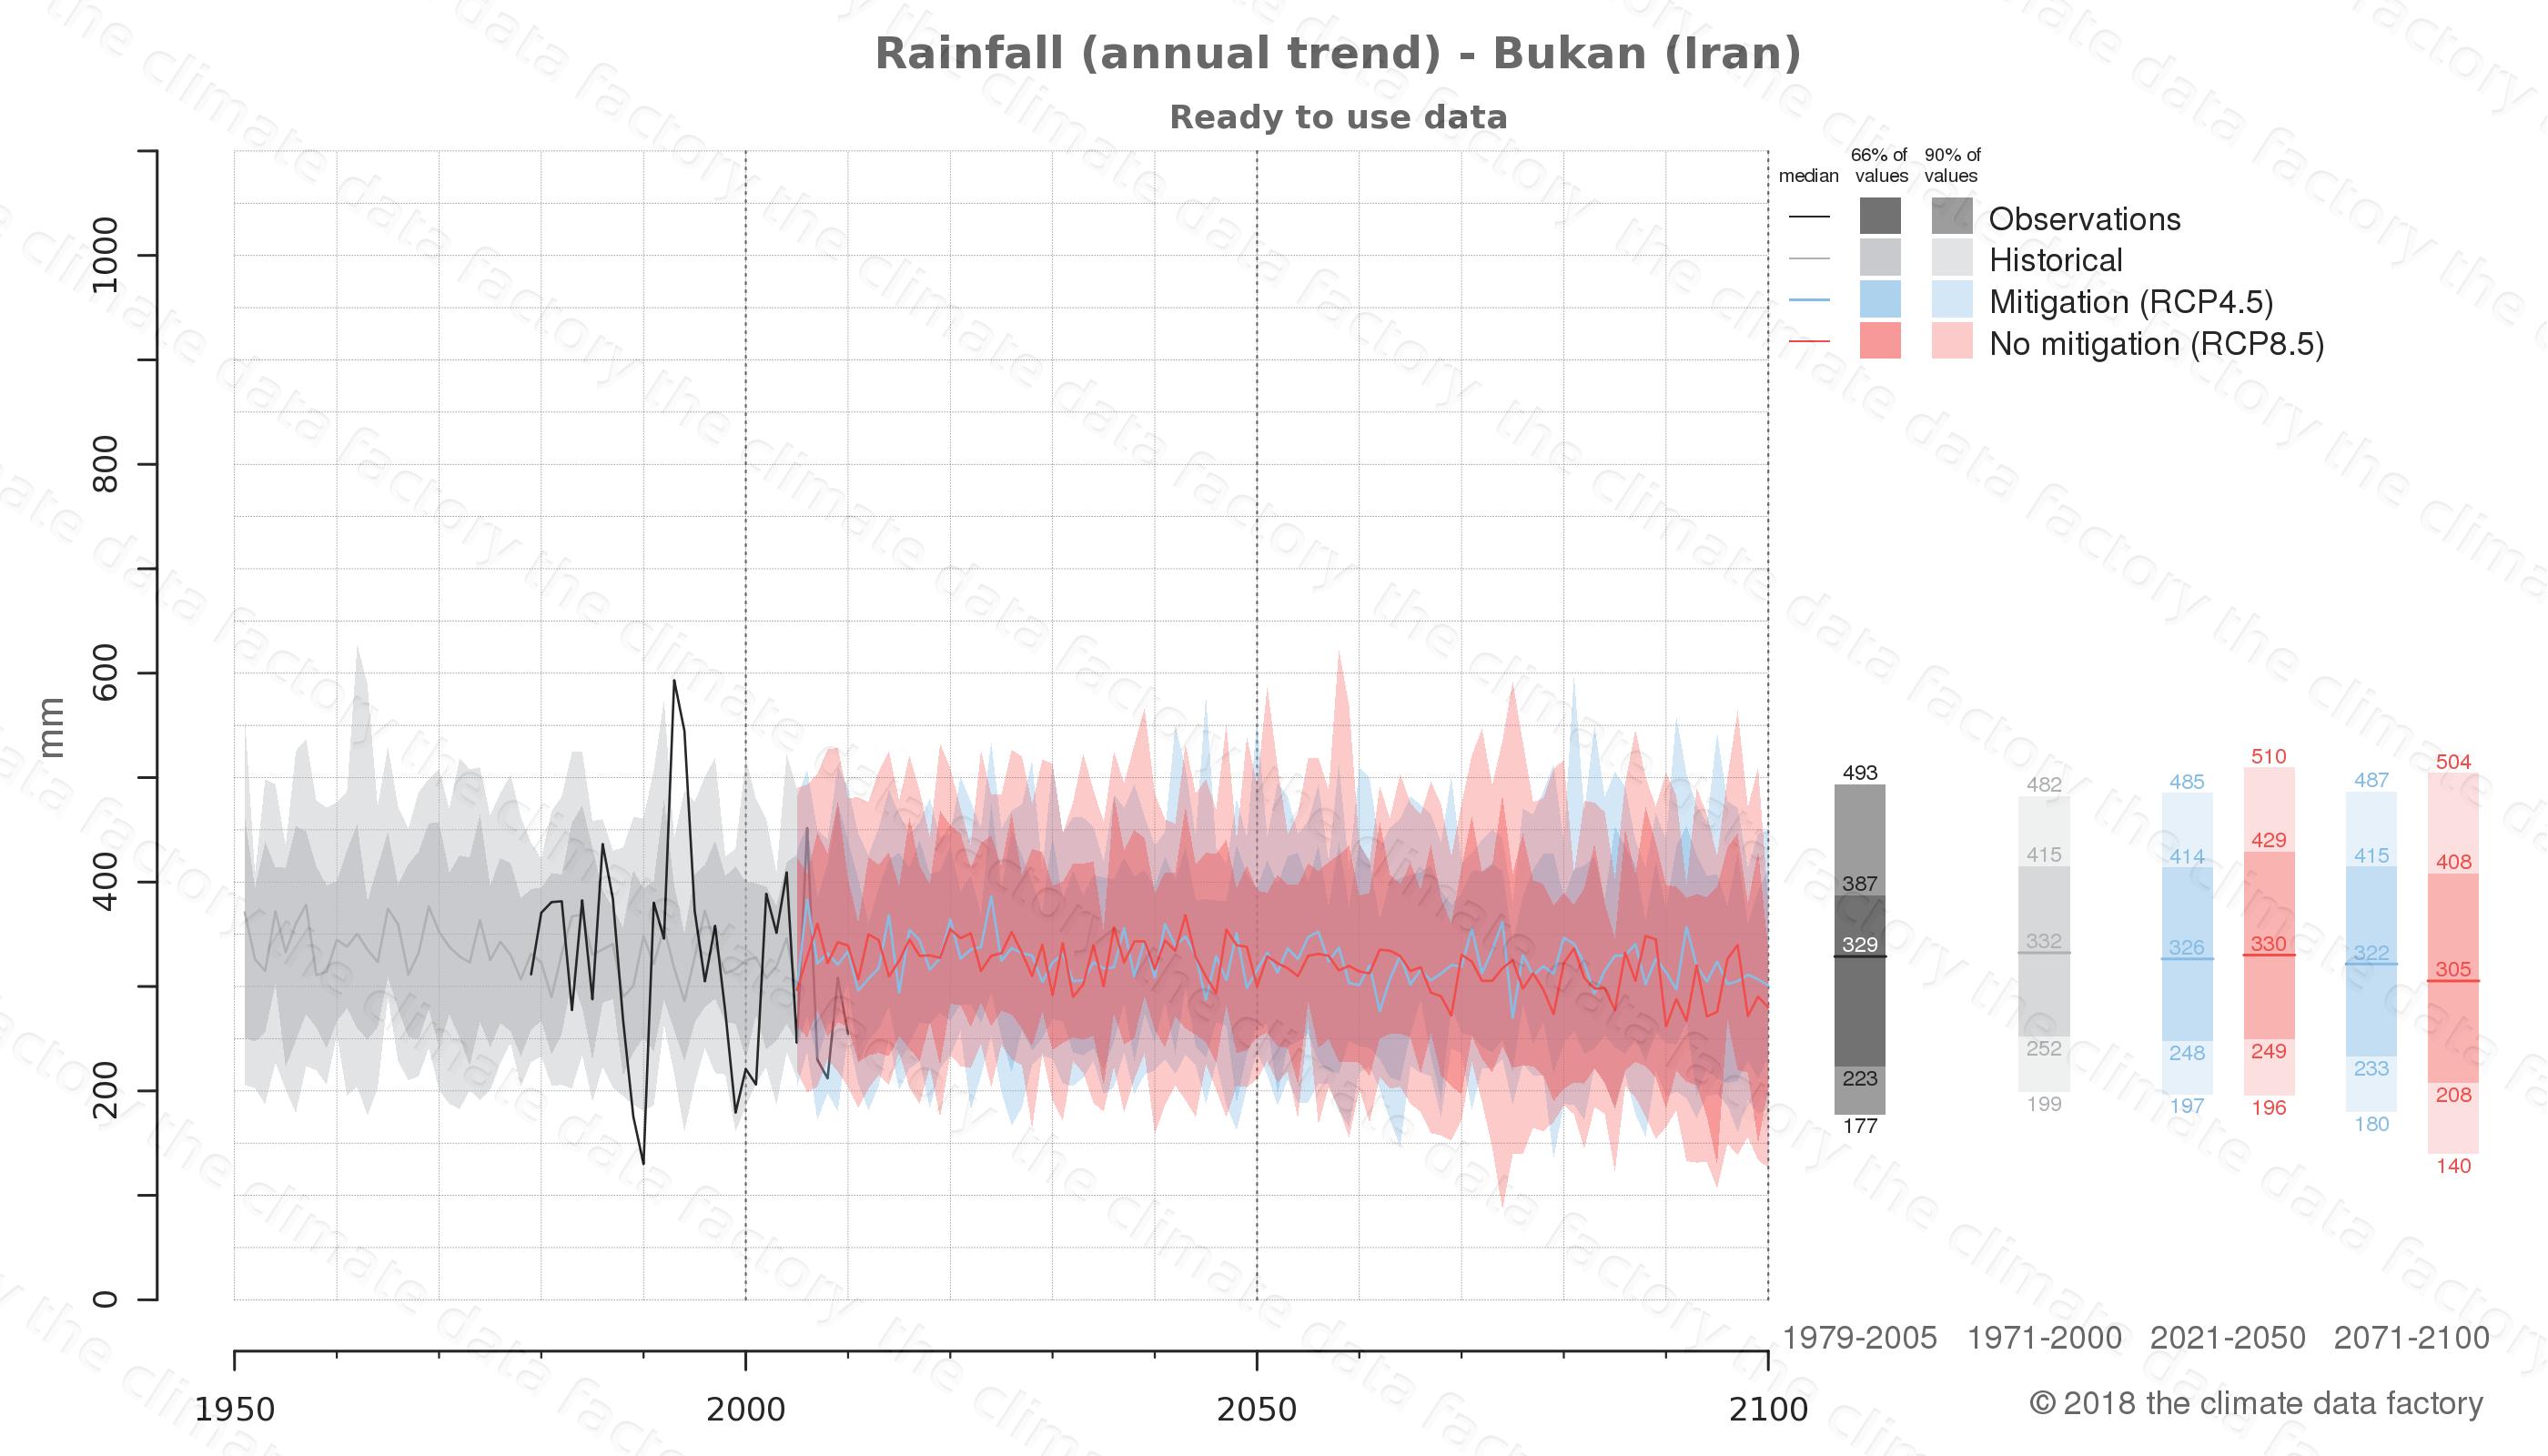 climate change data policy adaptation climate graph city data rainfall bukan iran